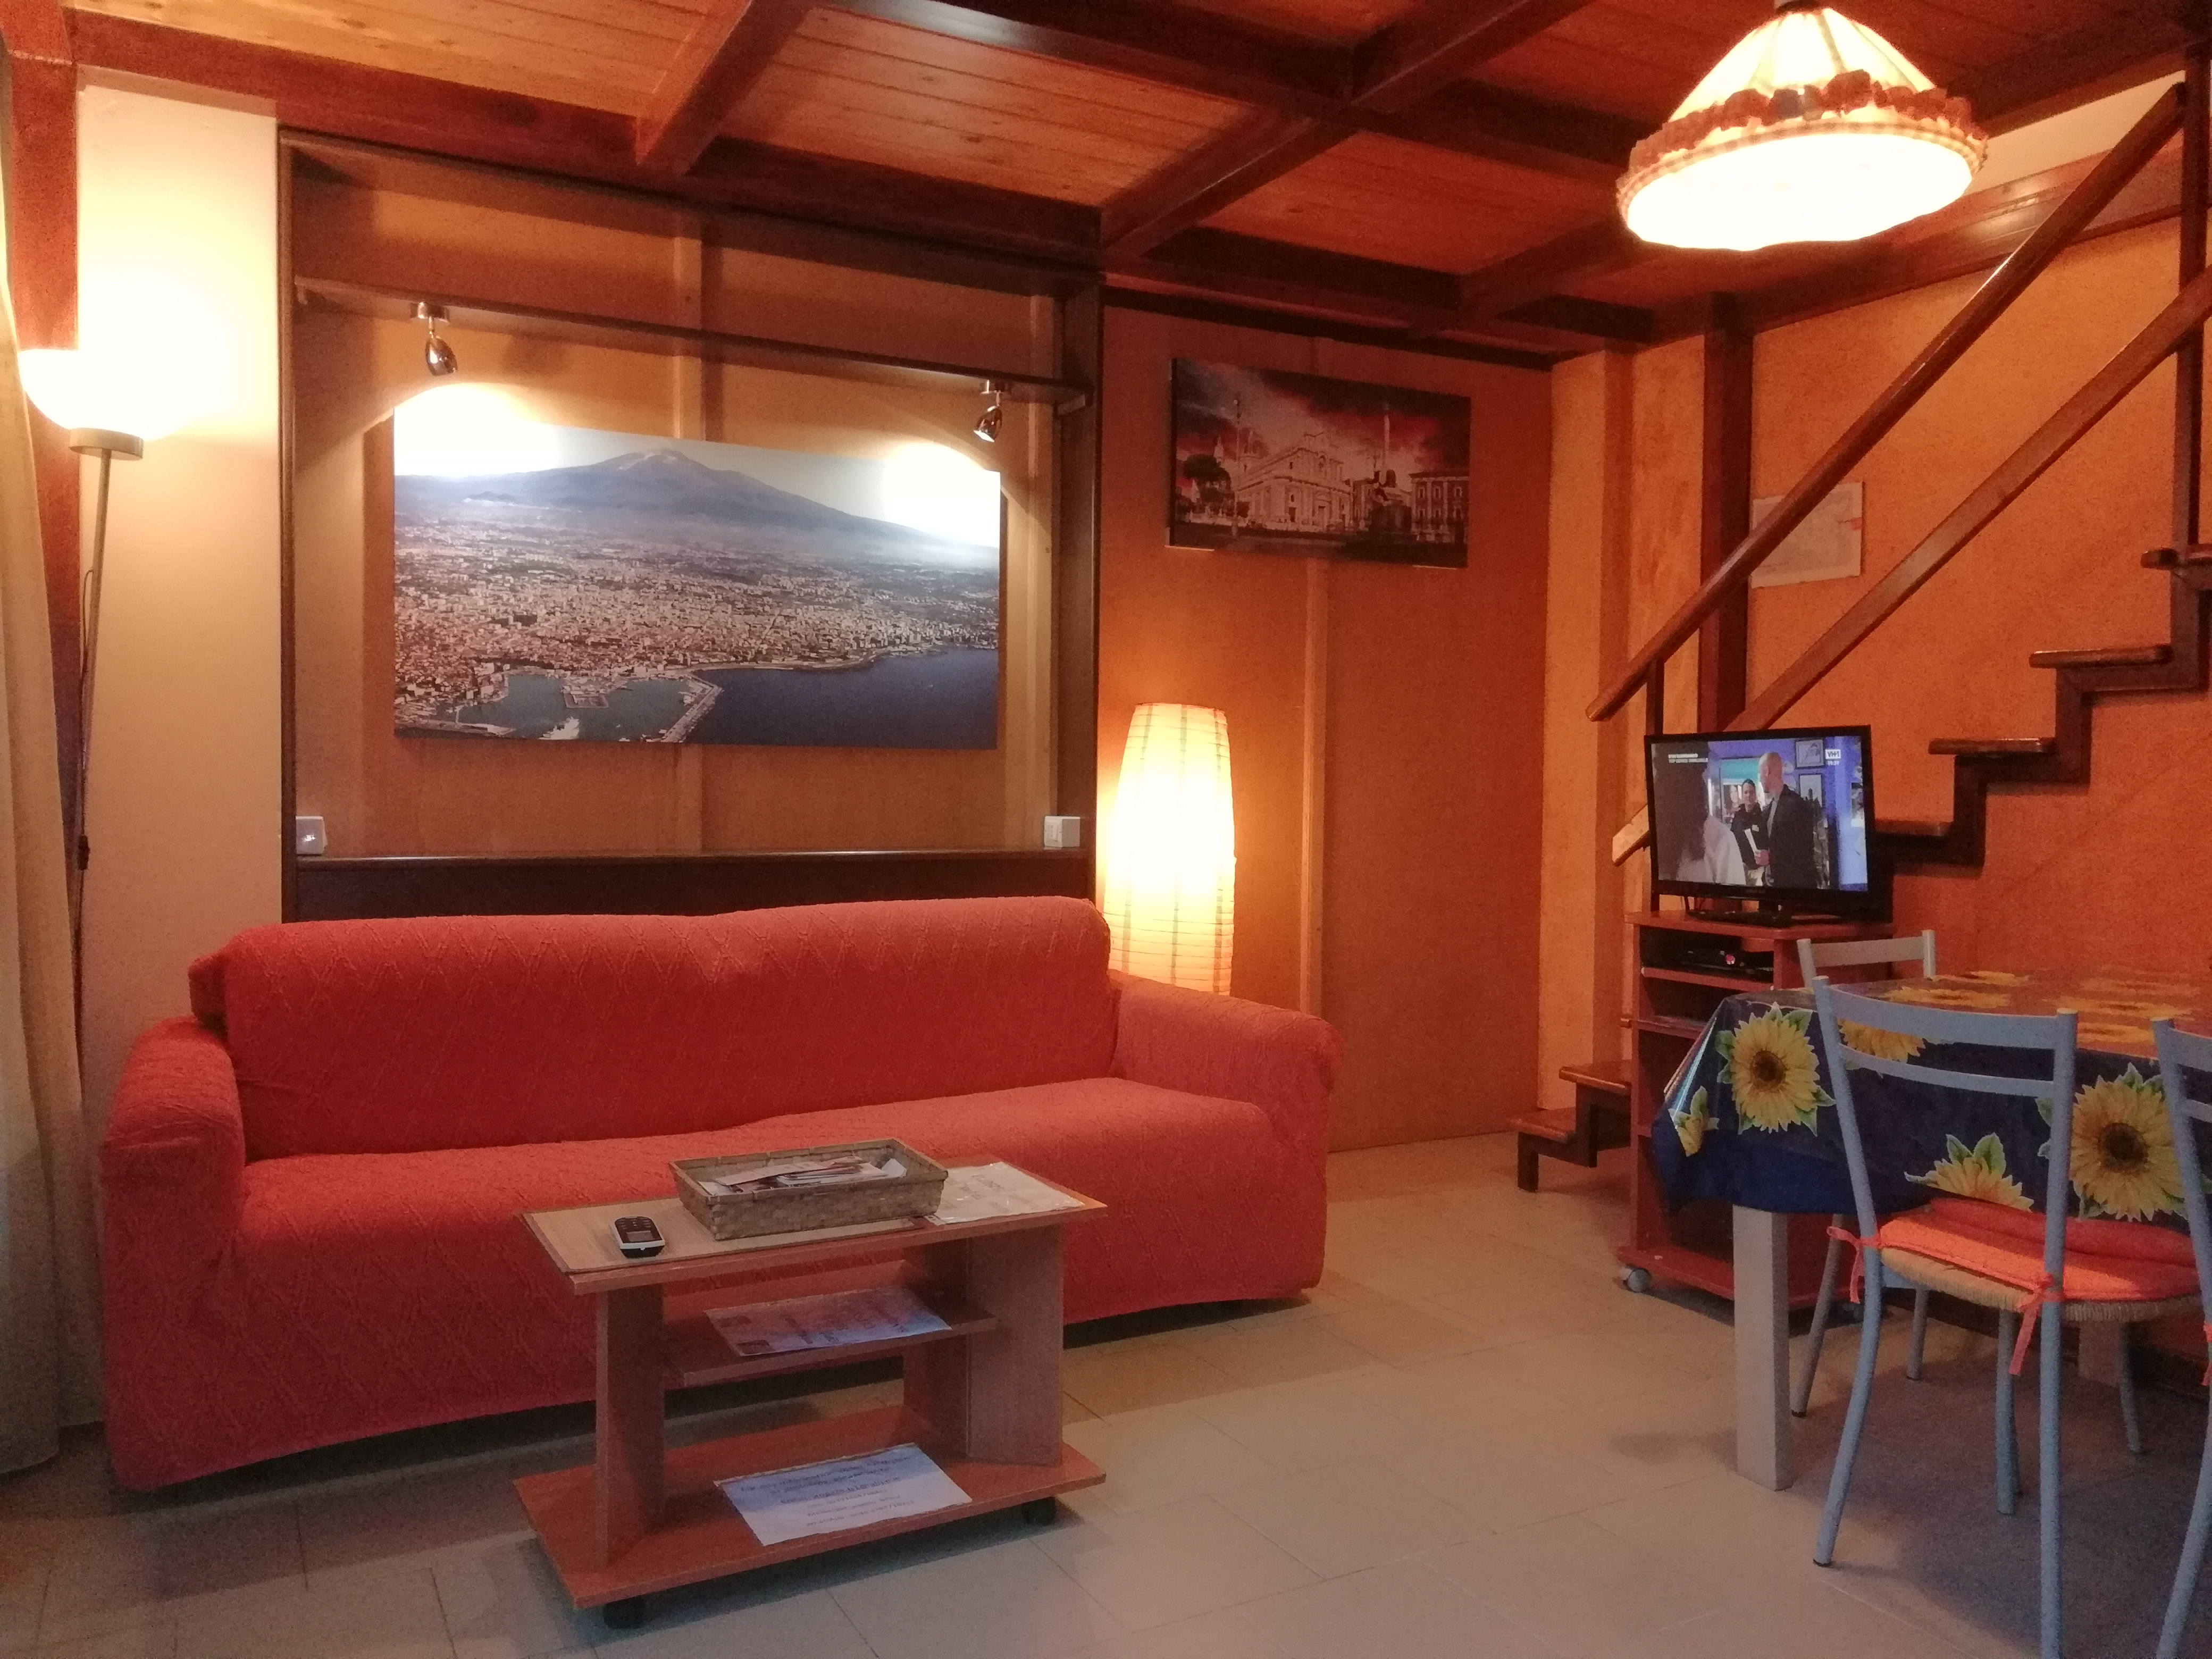 Ferienhaus Studio zwischen Etna und Taormina Mare schlieen (2379229), Santa Venerina, Catania, Sizilien, Italien, Bild 9